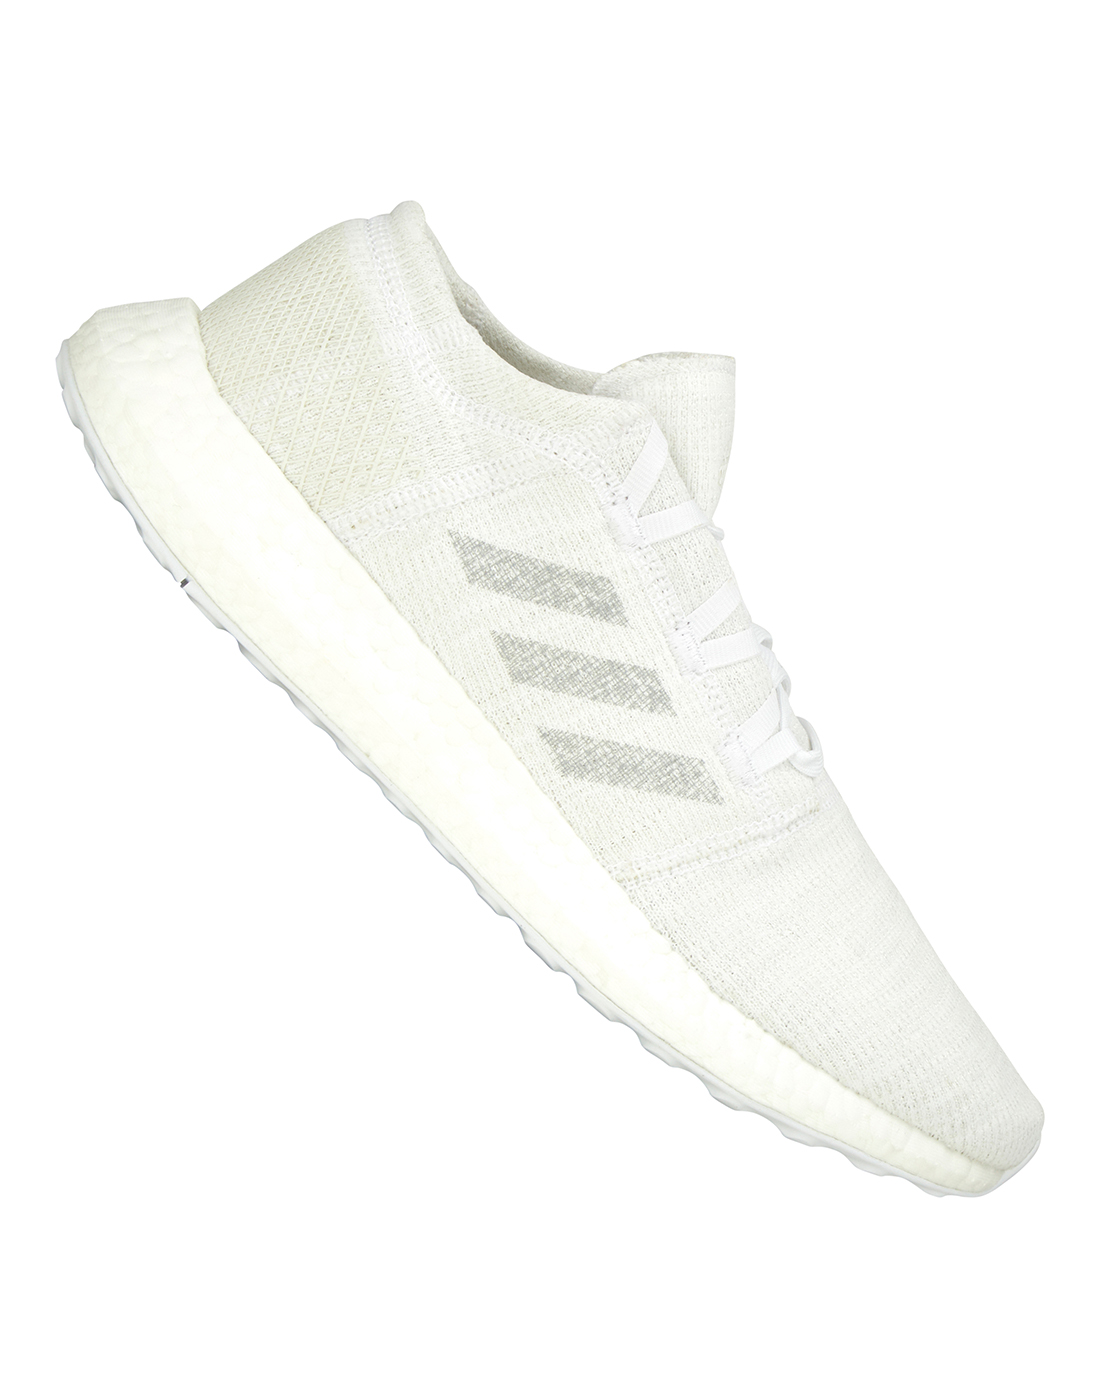 1042b684f6d2b Men s White adidas Pureboost Go